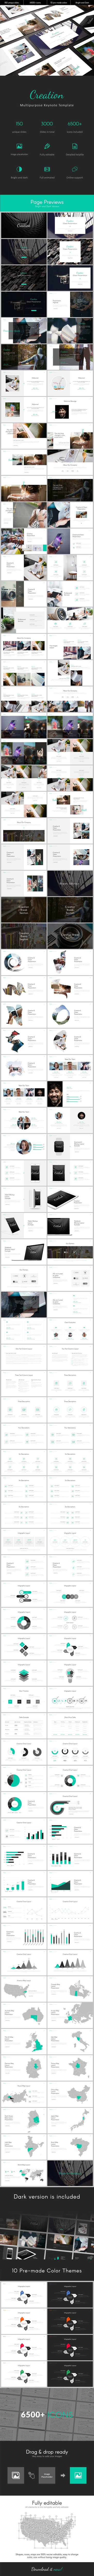 Creation Multipurpose Keynote Template - Business Keynote Templates